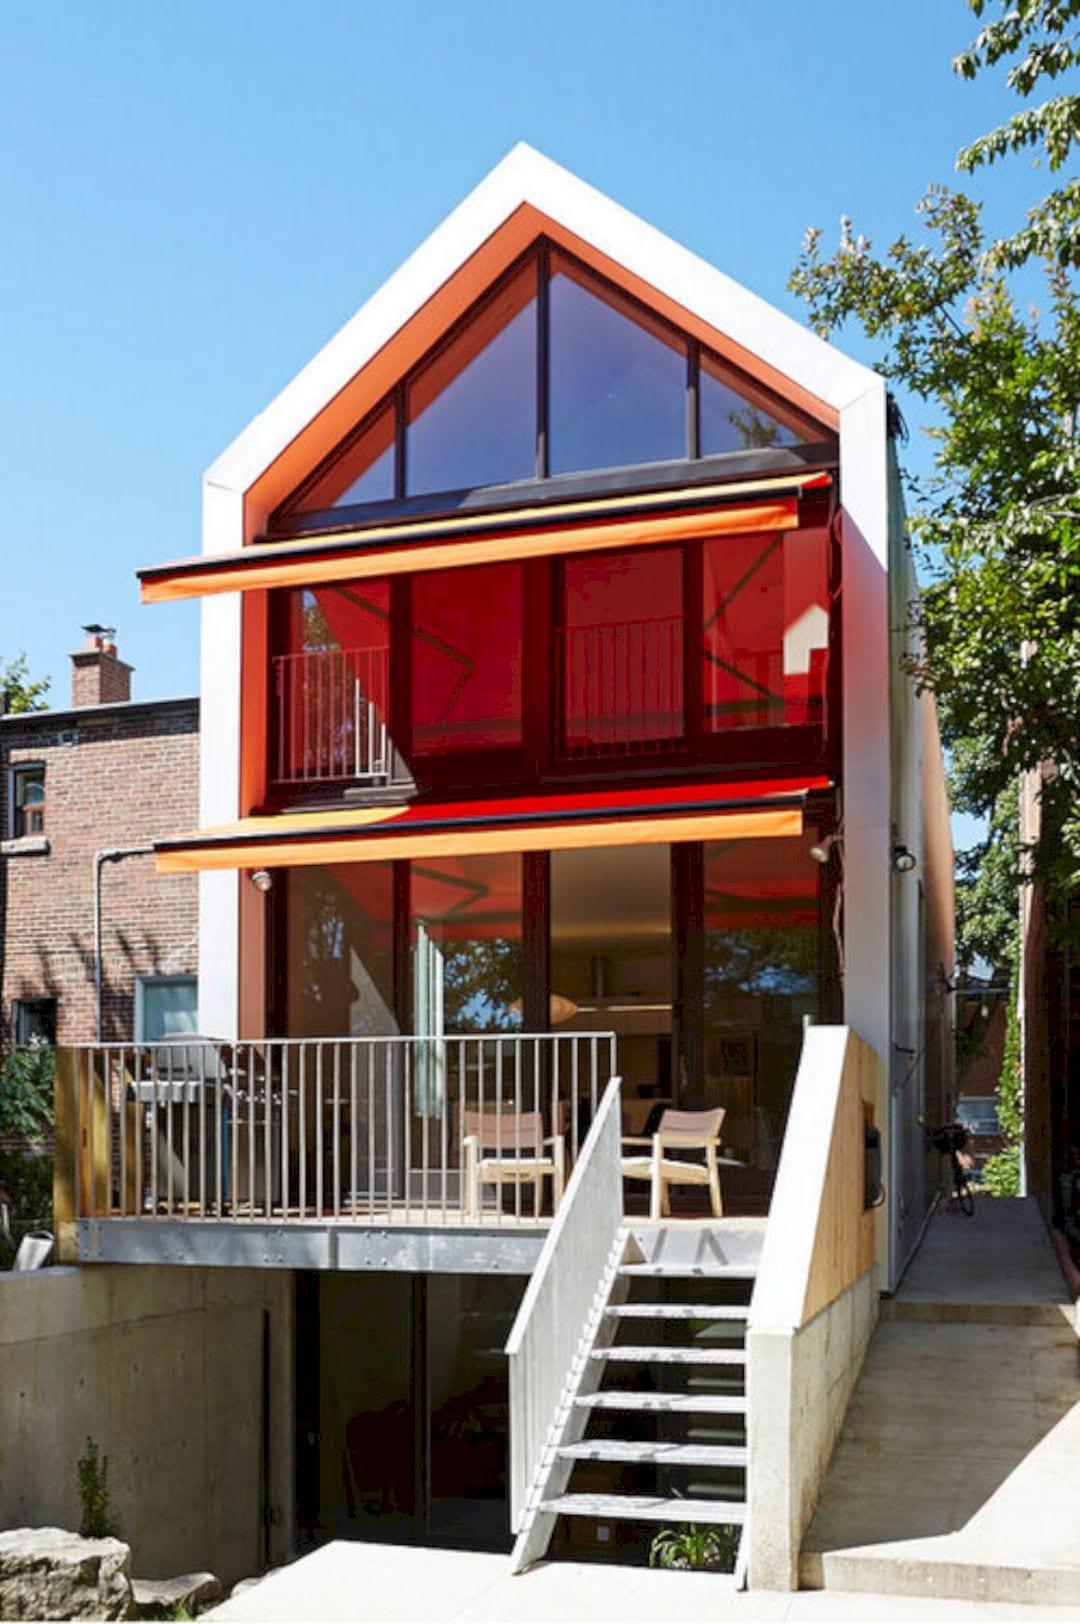 Benson House By KOHN SHNIER Architects 2